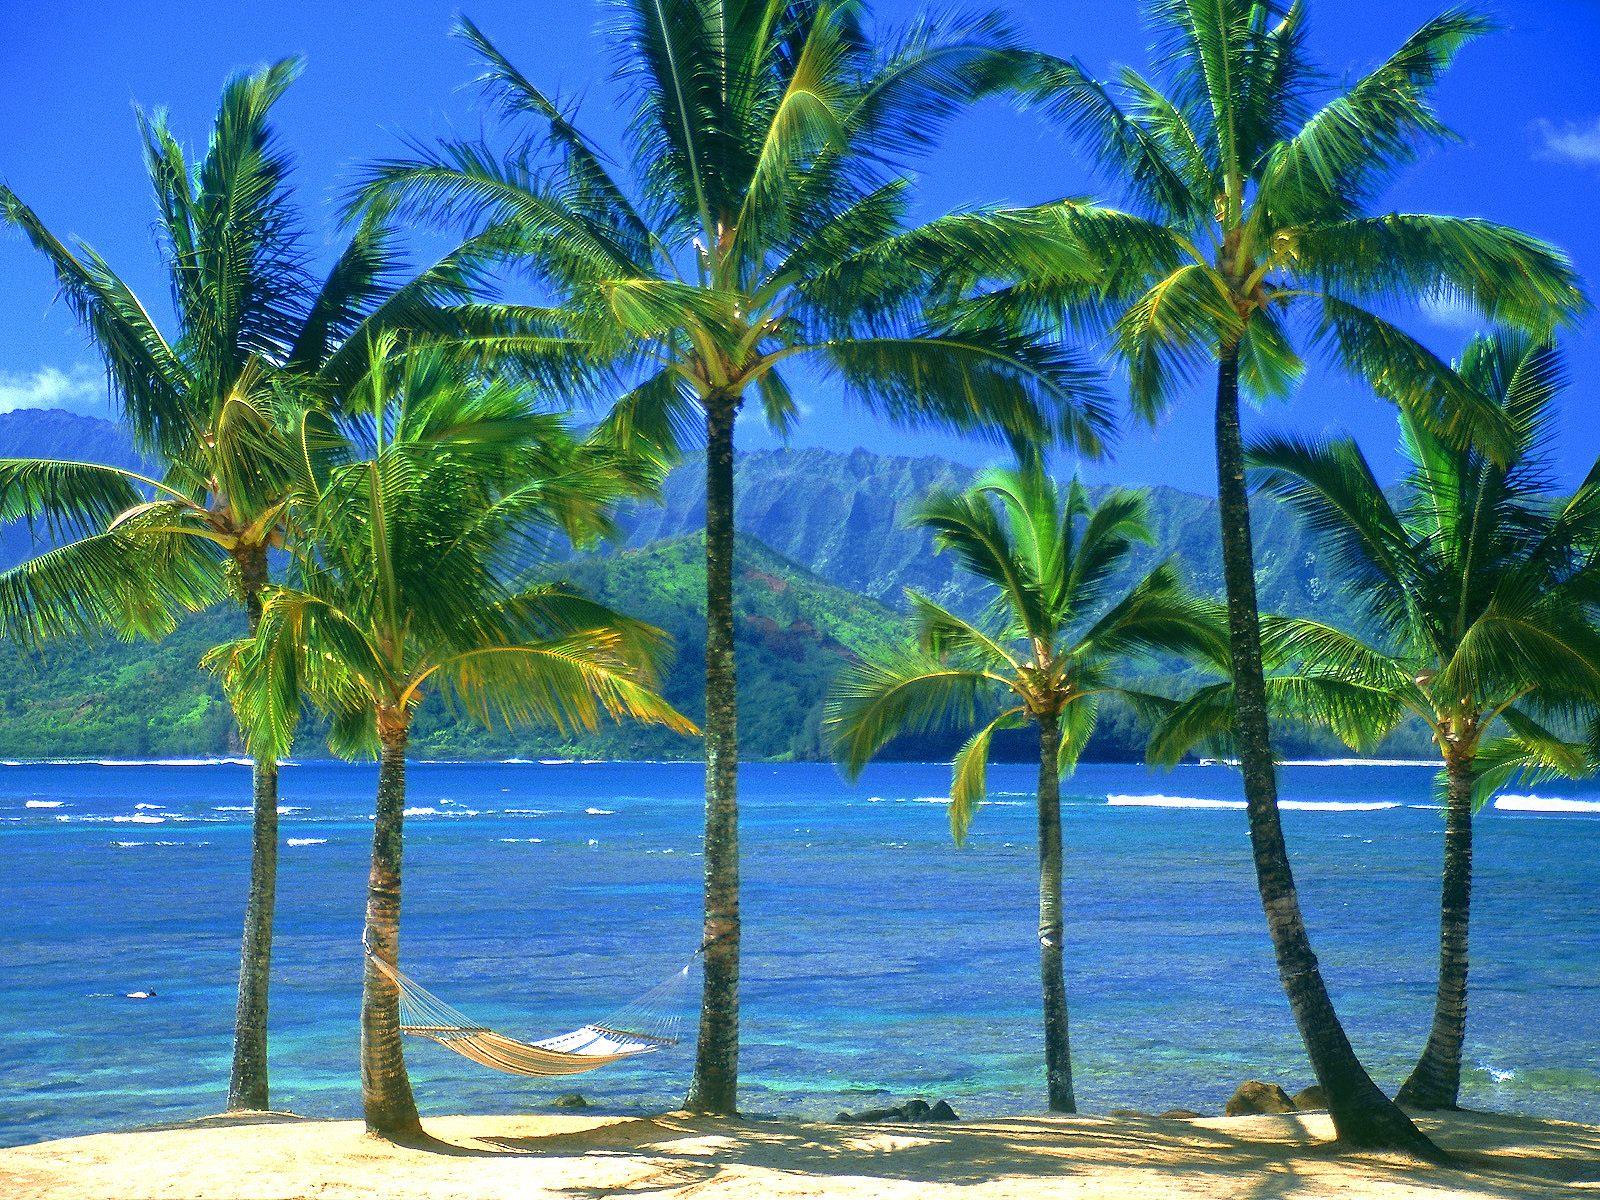 Kauai An-Empty-Hammock-Kauai-Hawaii